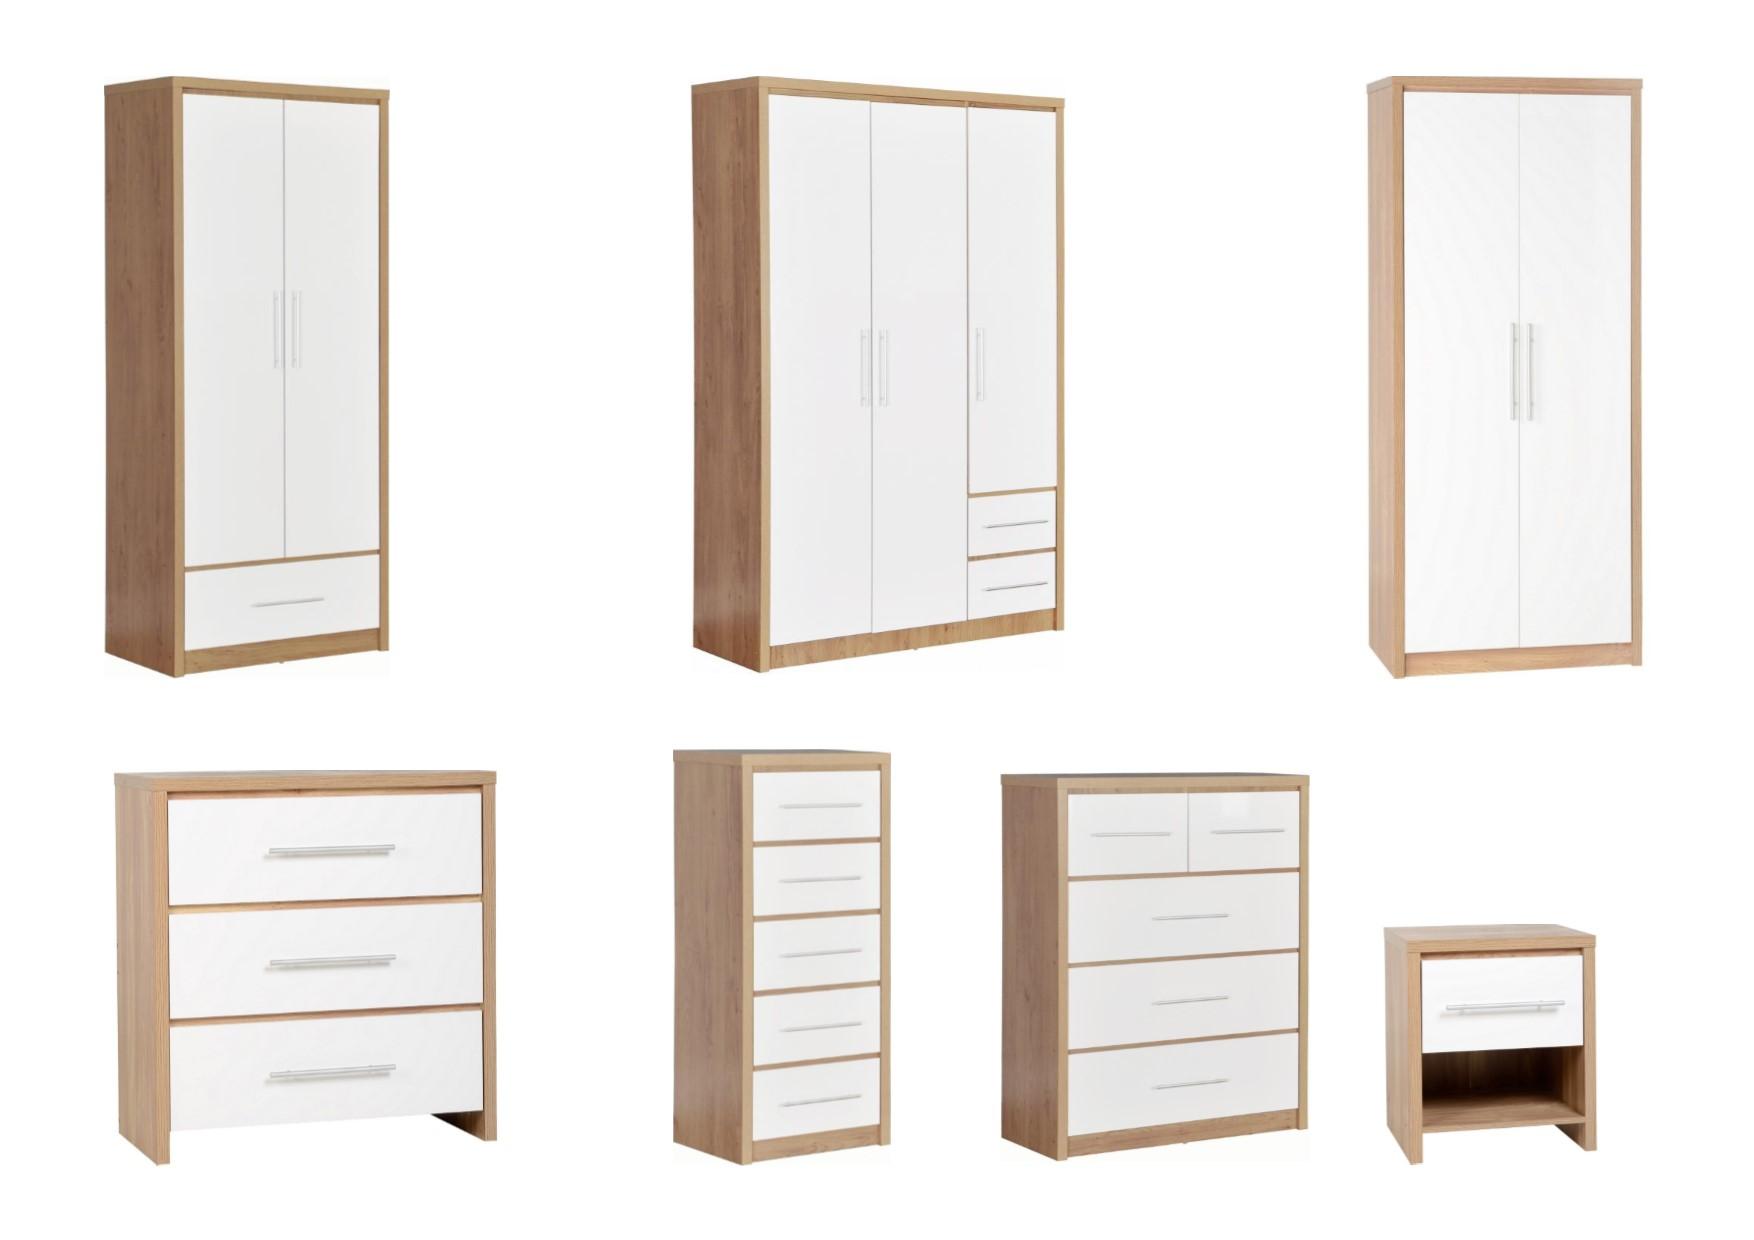 Details About Seconique Seville Bedroom Range Oak White High Gloss Wardrobe Chest Bedside